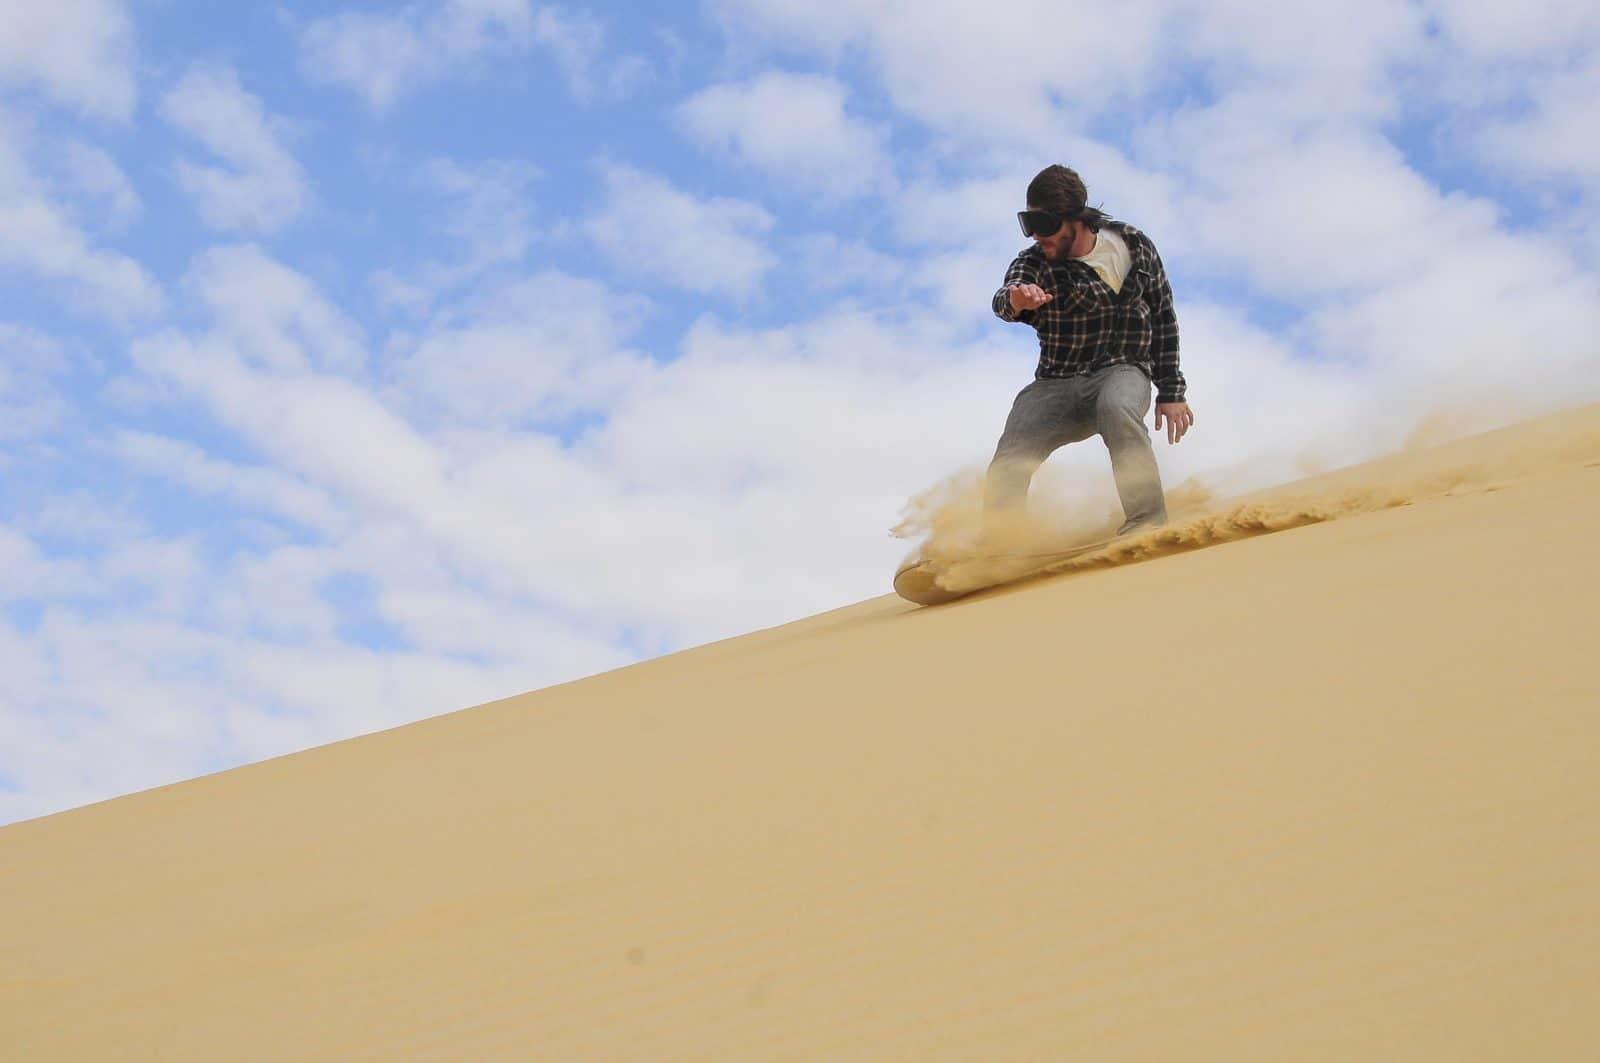 Sandboarding in Port Stephens